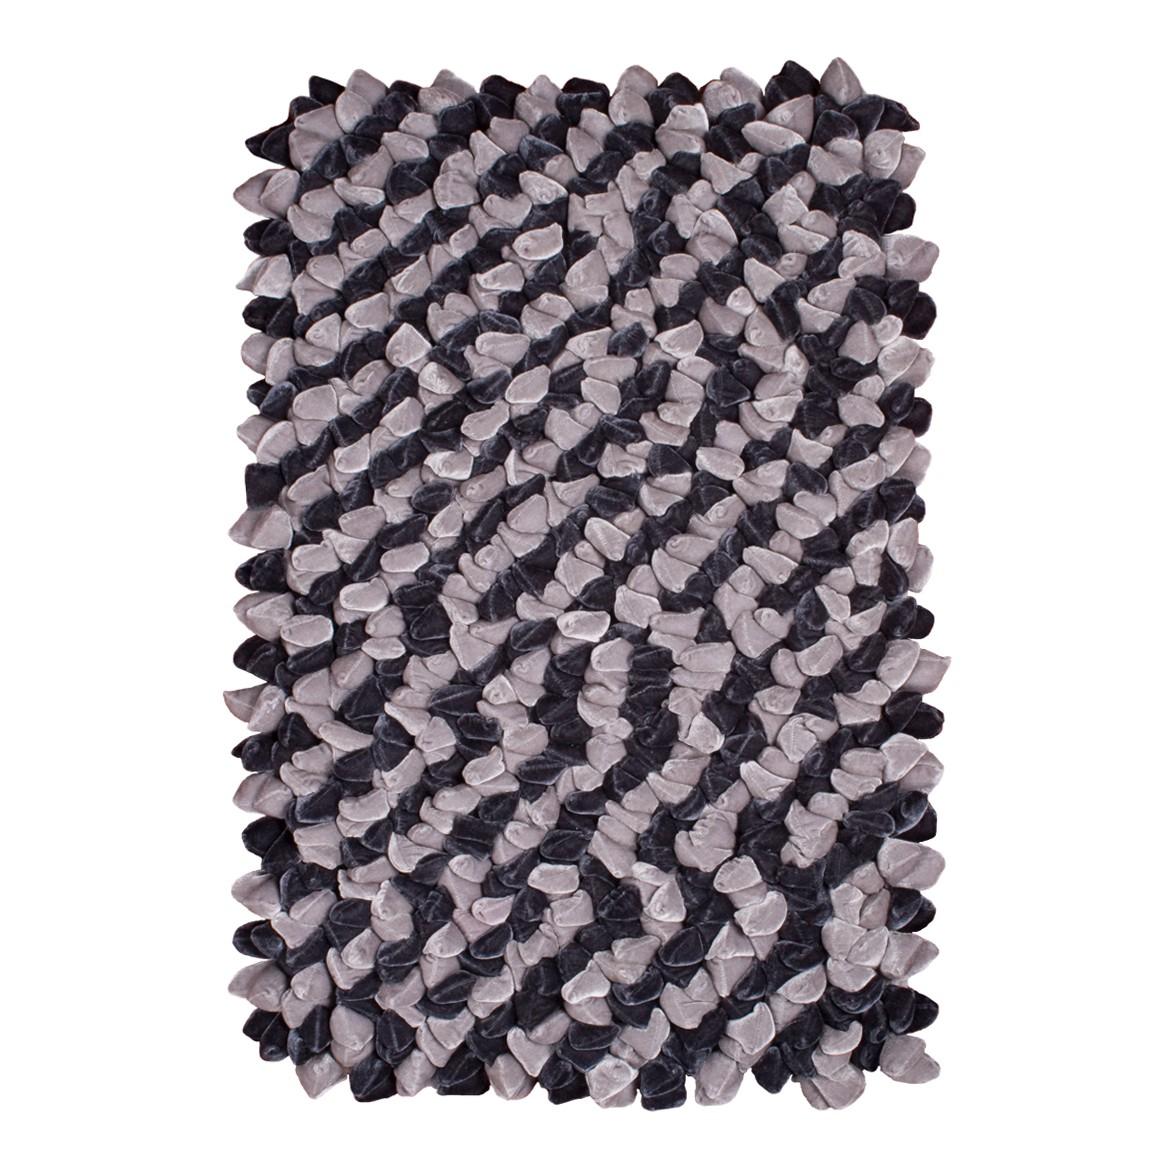 Teppich Sethos - Kunstfaser - Anthrazit / Hellgrau - 160 x 230 cm